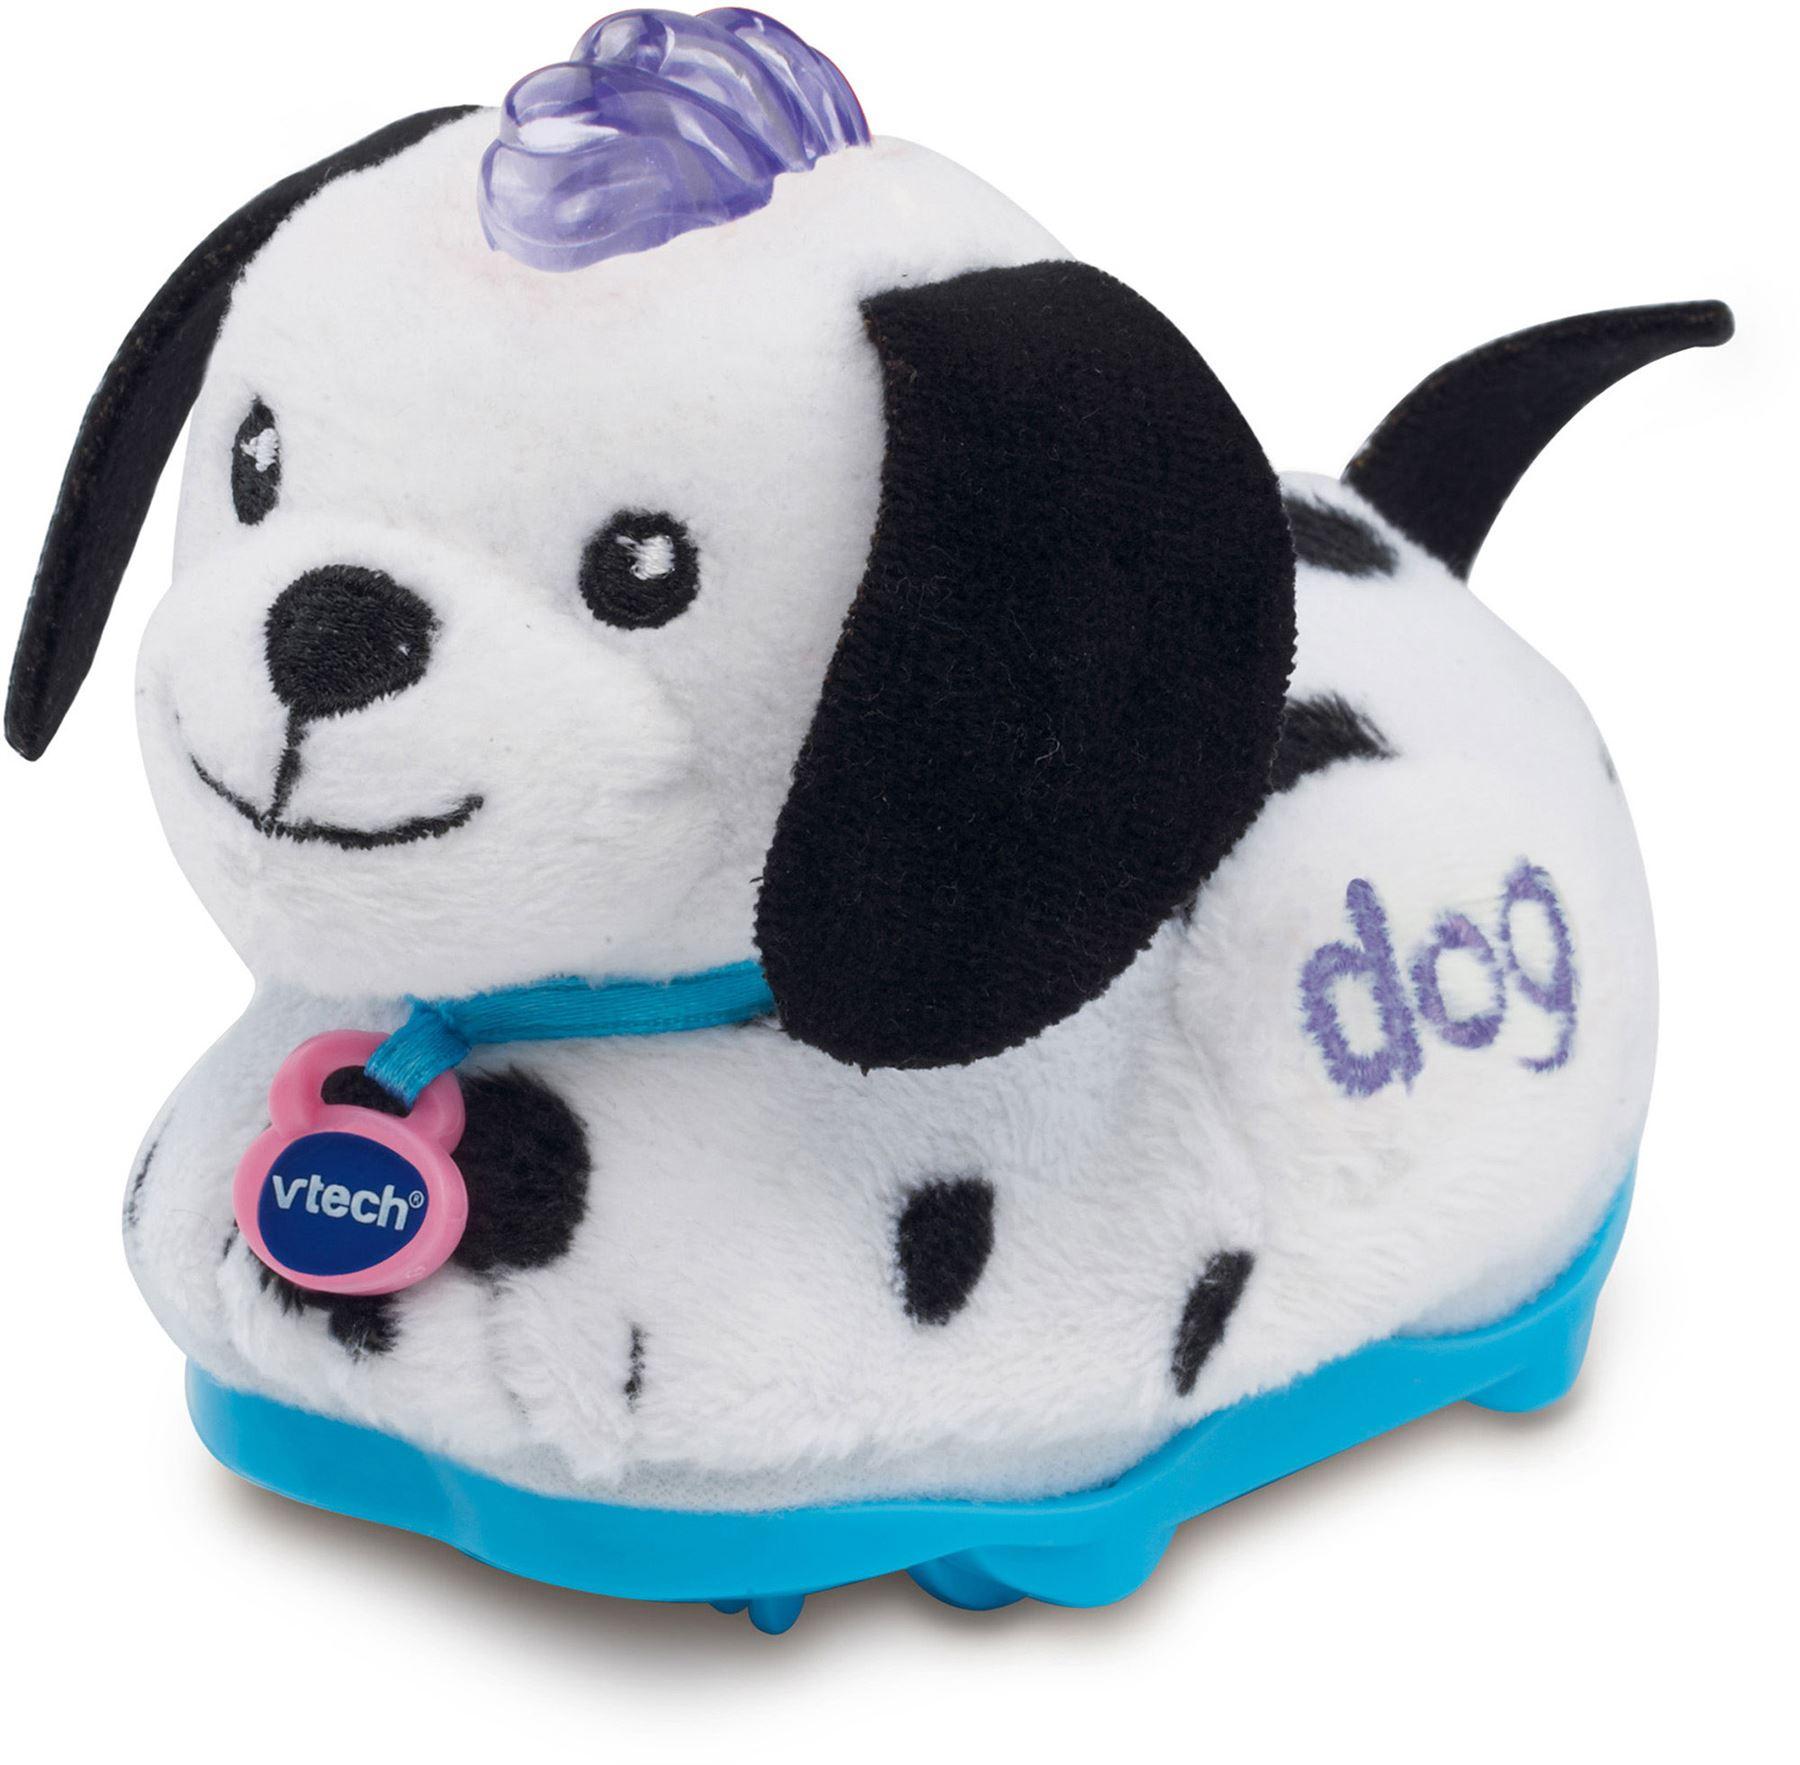 Vtech TOOT-TOOT ANIMALS FURRY DOG Educational Preschool Toy